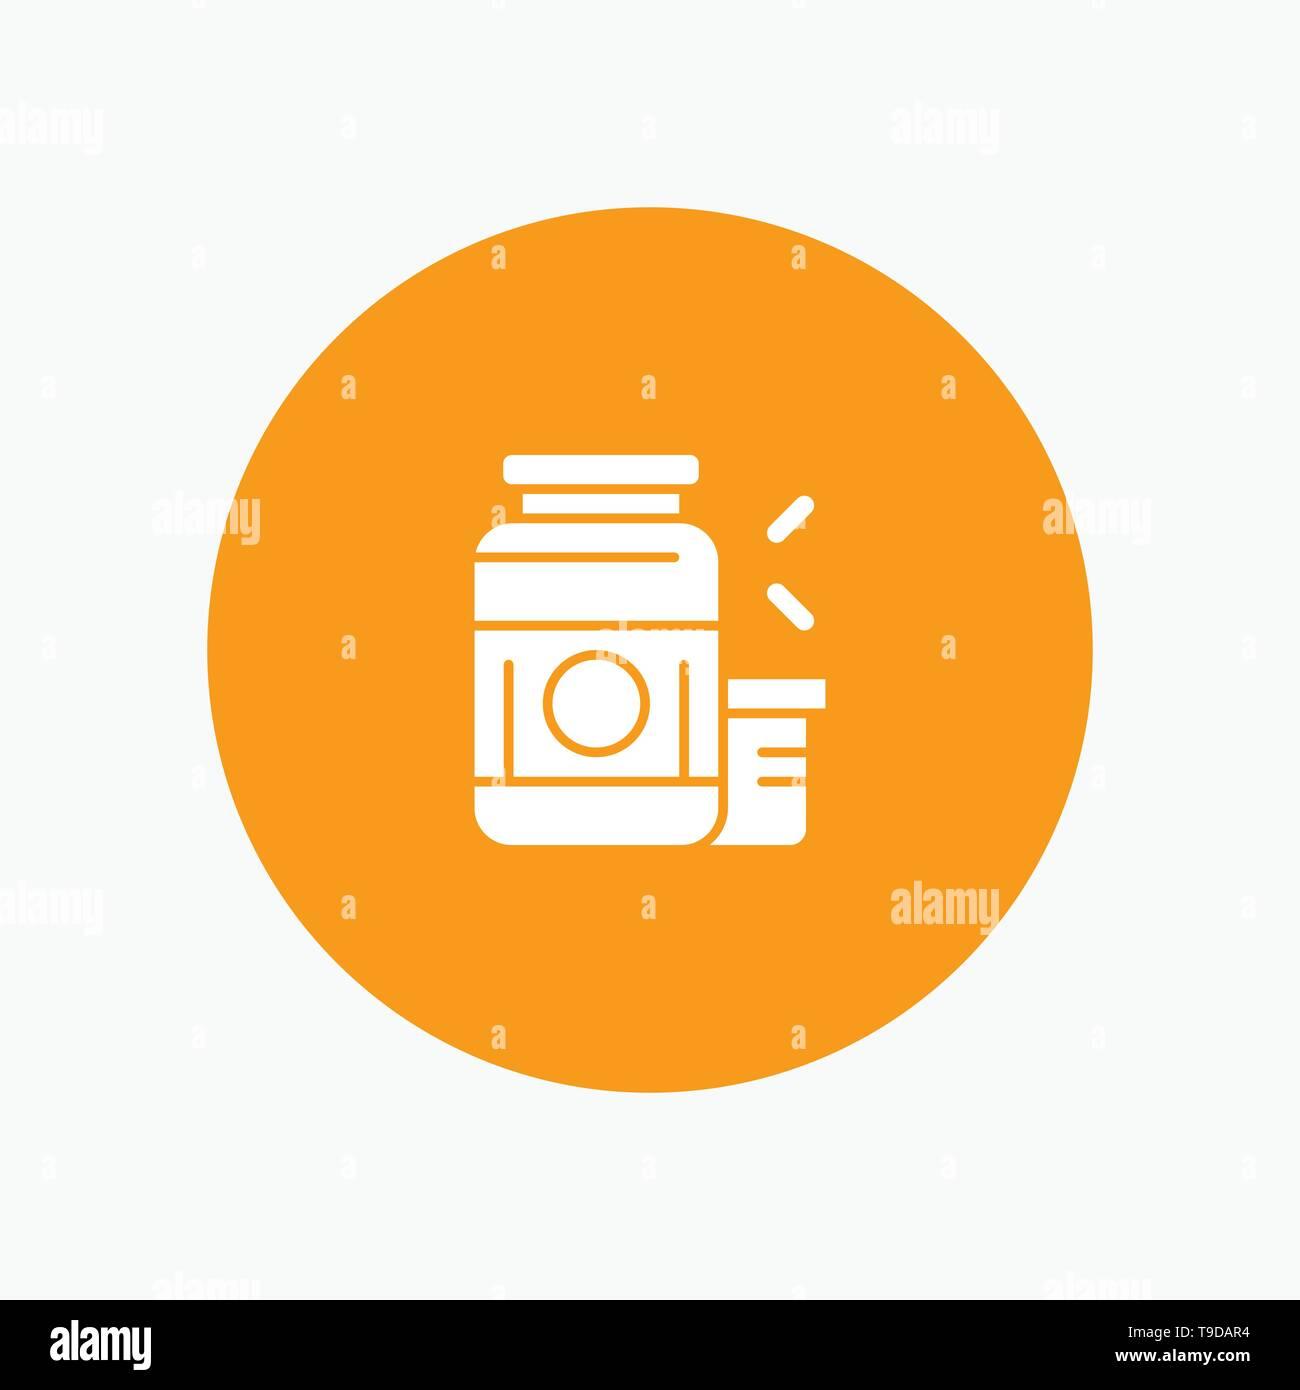 Bodybuilding, Gainer, Protein, Sports, Supplement - Stock Image